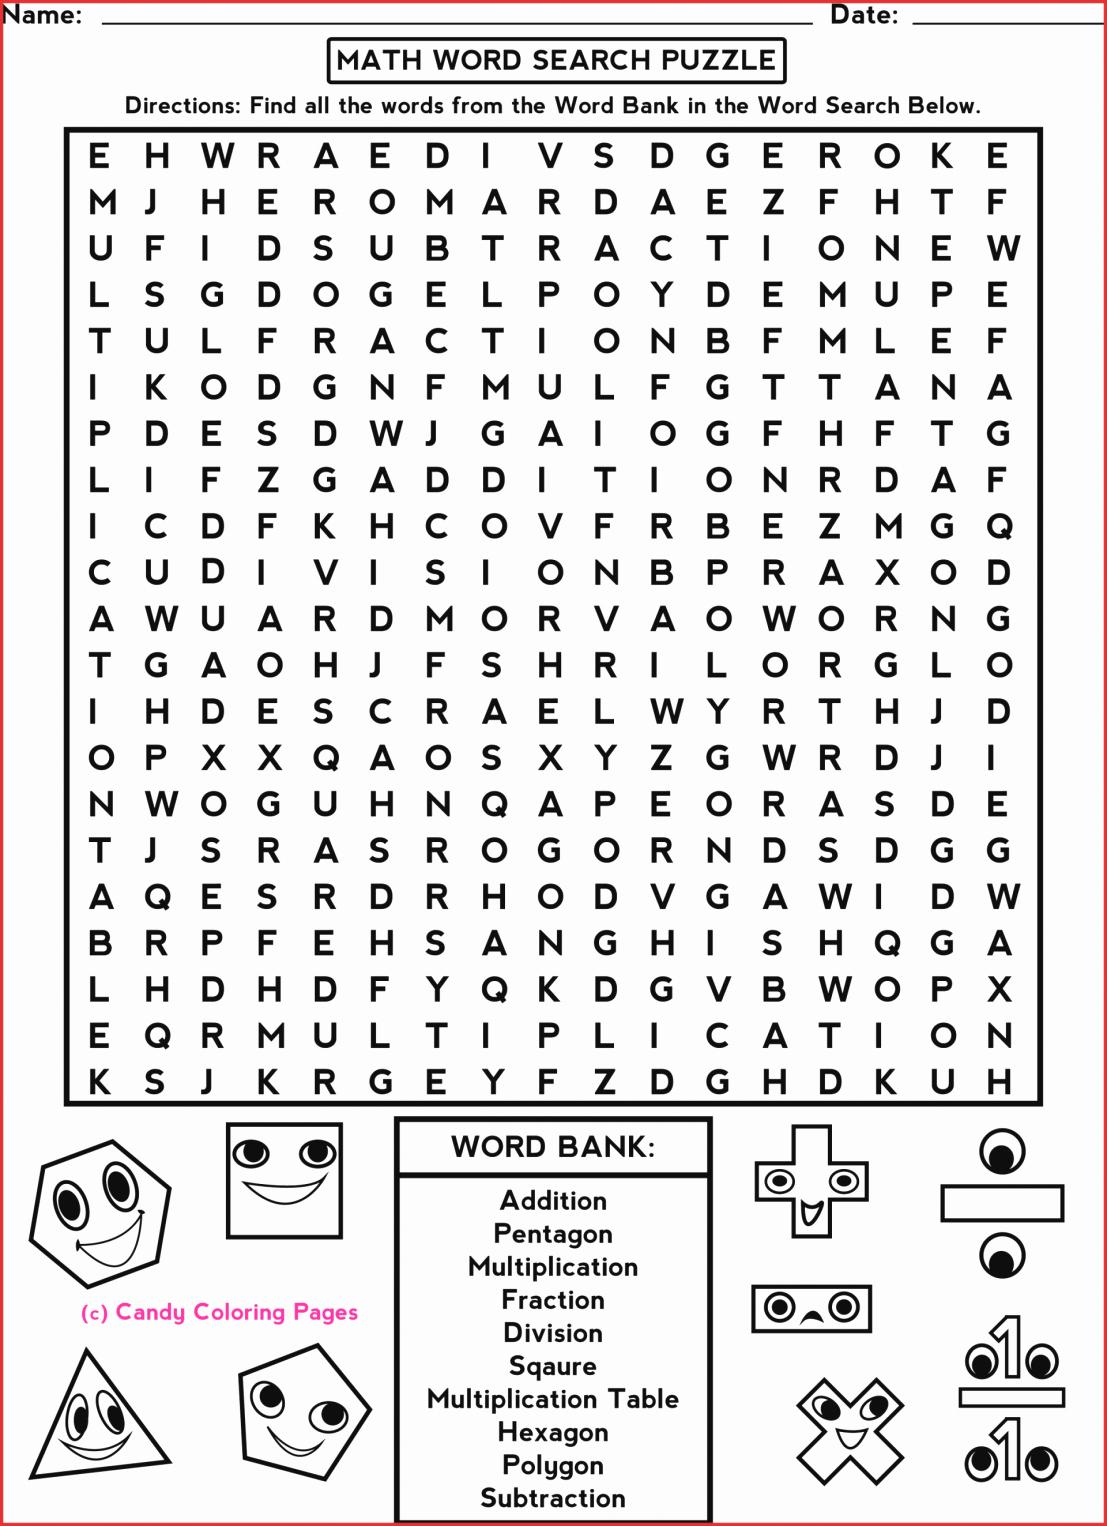 7Th Grade Crossword Puzzles Fresh 7Th Grade Math Word Search - Free Printable Crossword Puzzles For 7Th Graders